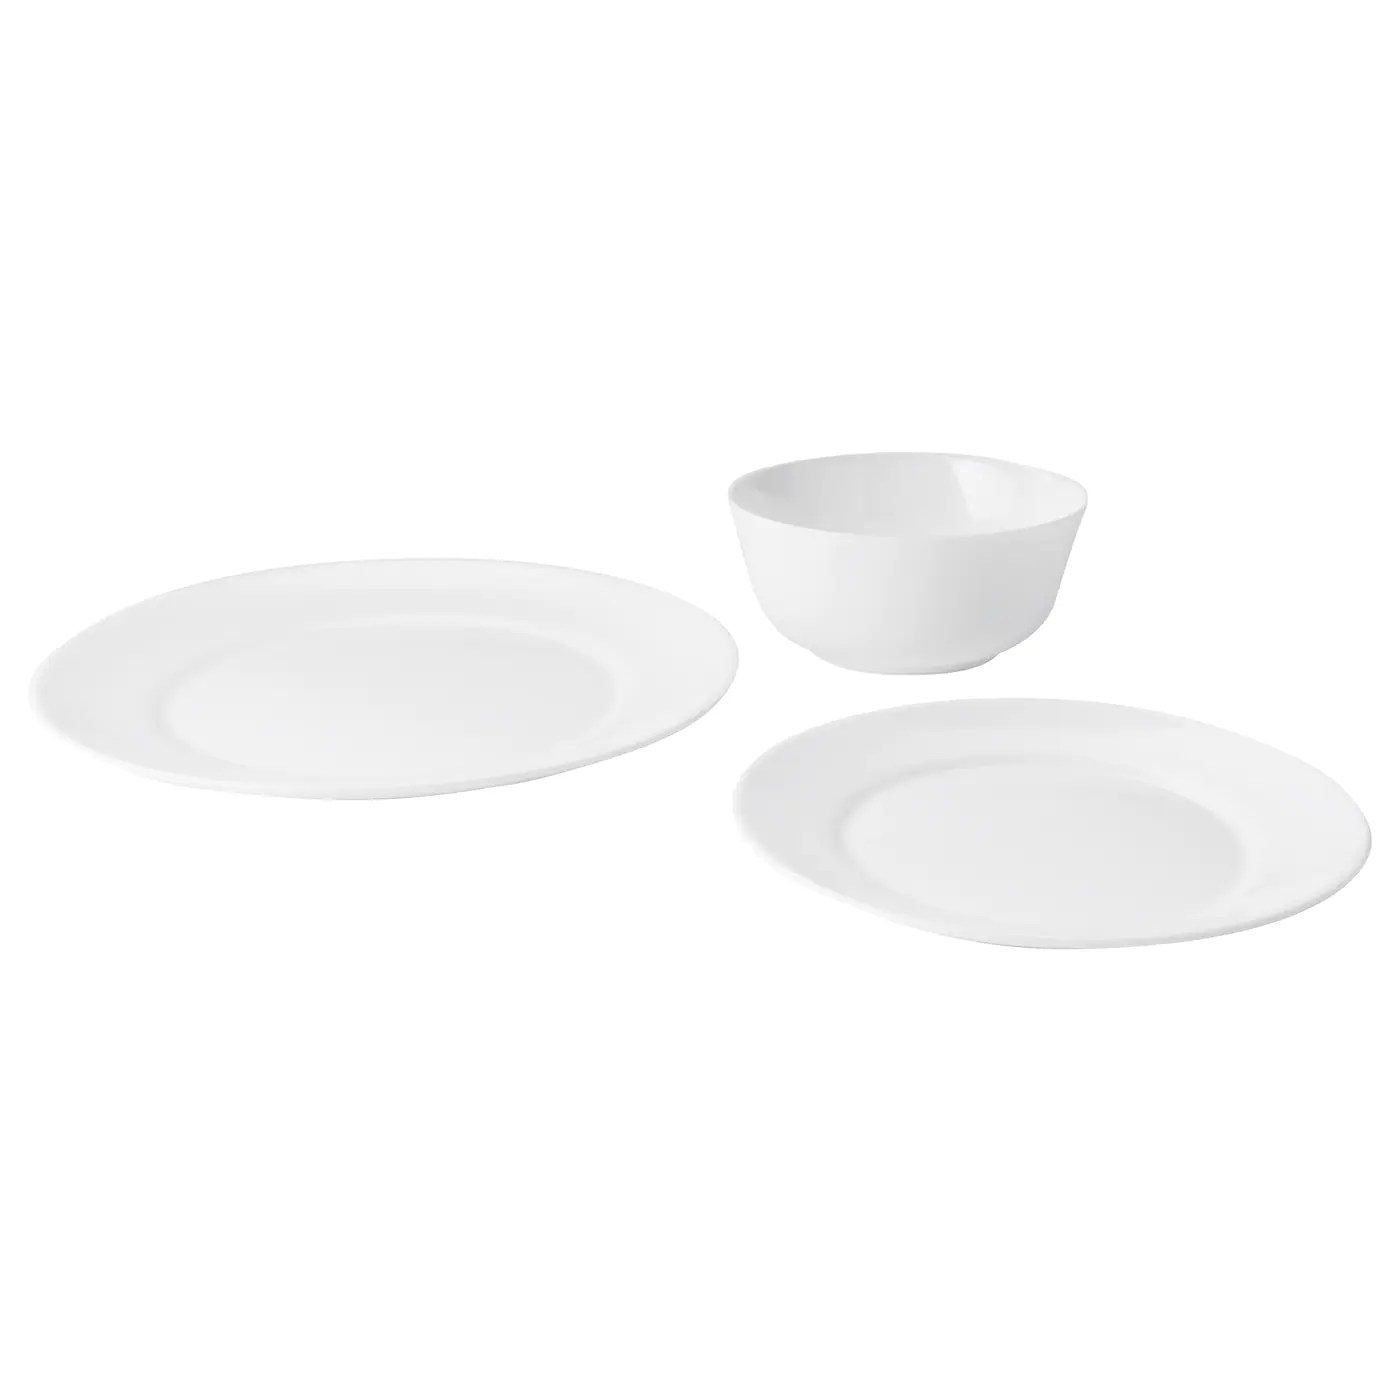 Dinner Set Dinnerware Square Black Plate Bowl Tableware 12 18 Pc Ikea Backig Spaar Org Pe